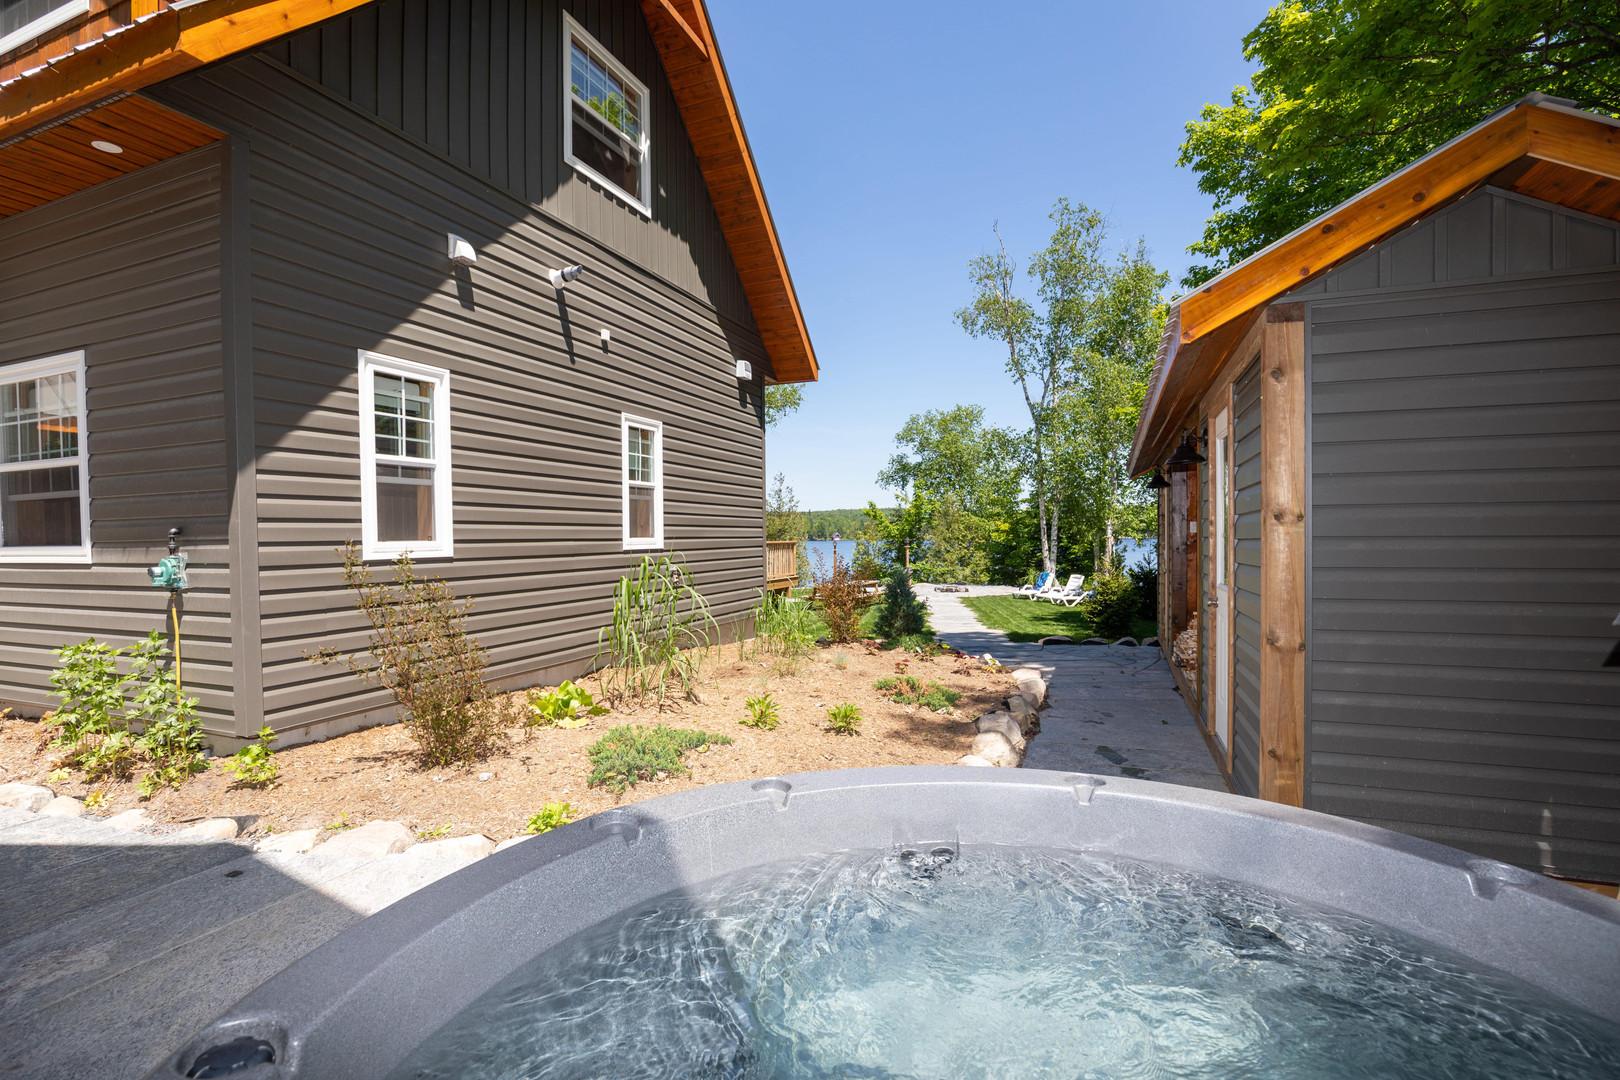 Muskoka cottage hot tub with lake view